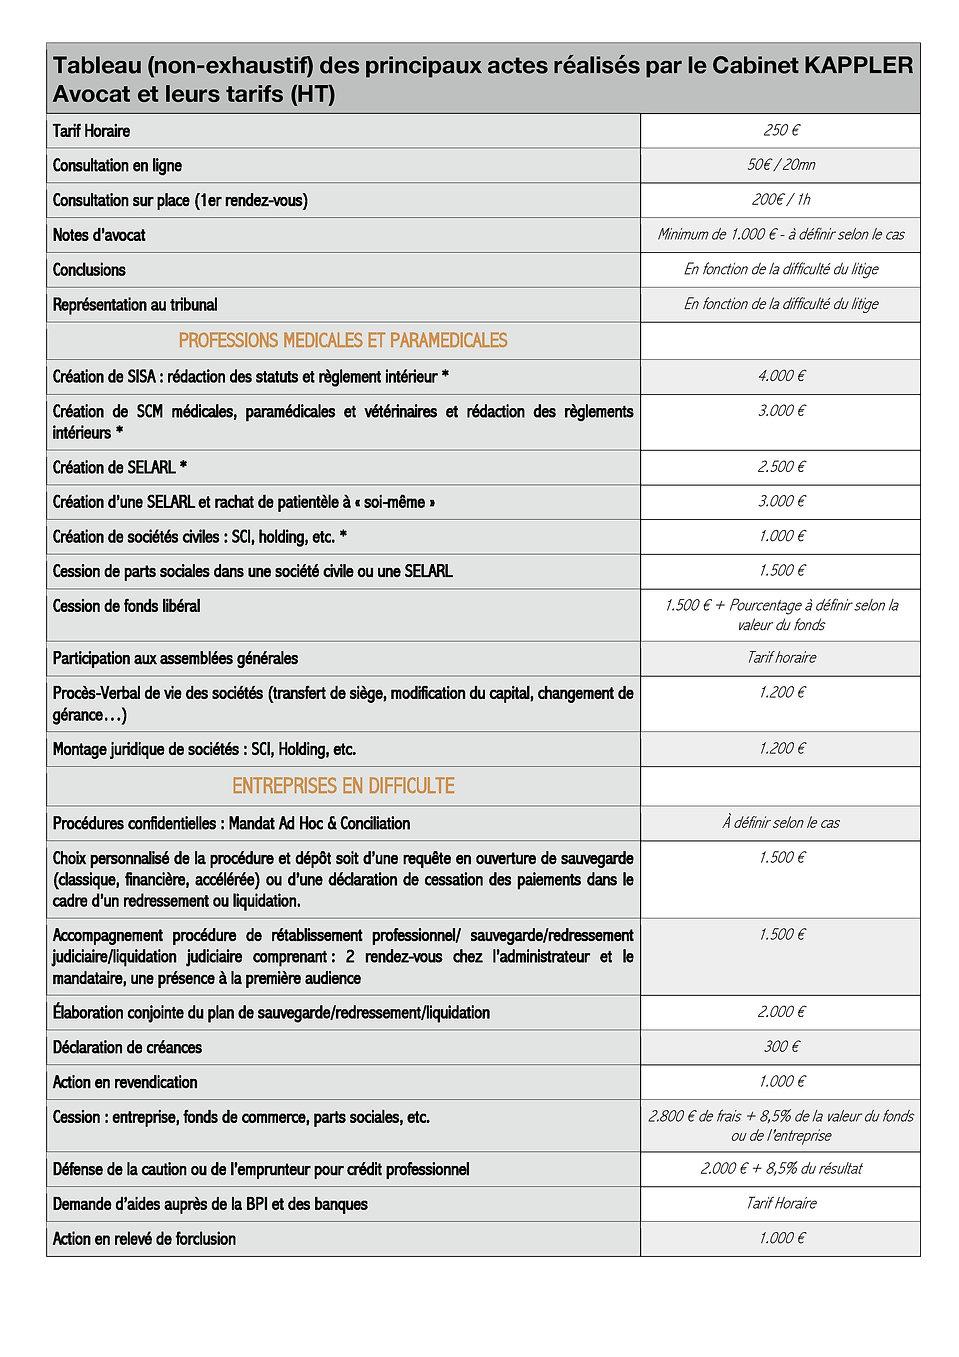 Tableau_honoraire-prestations_P1_25-09.j